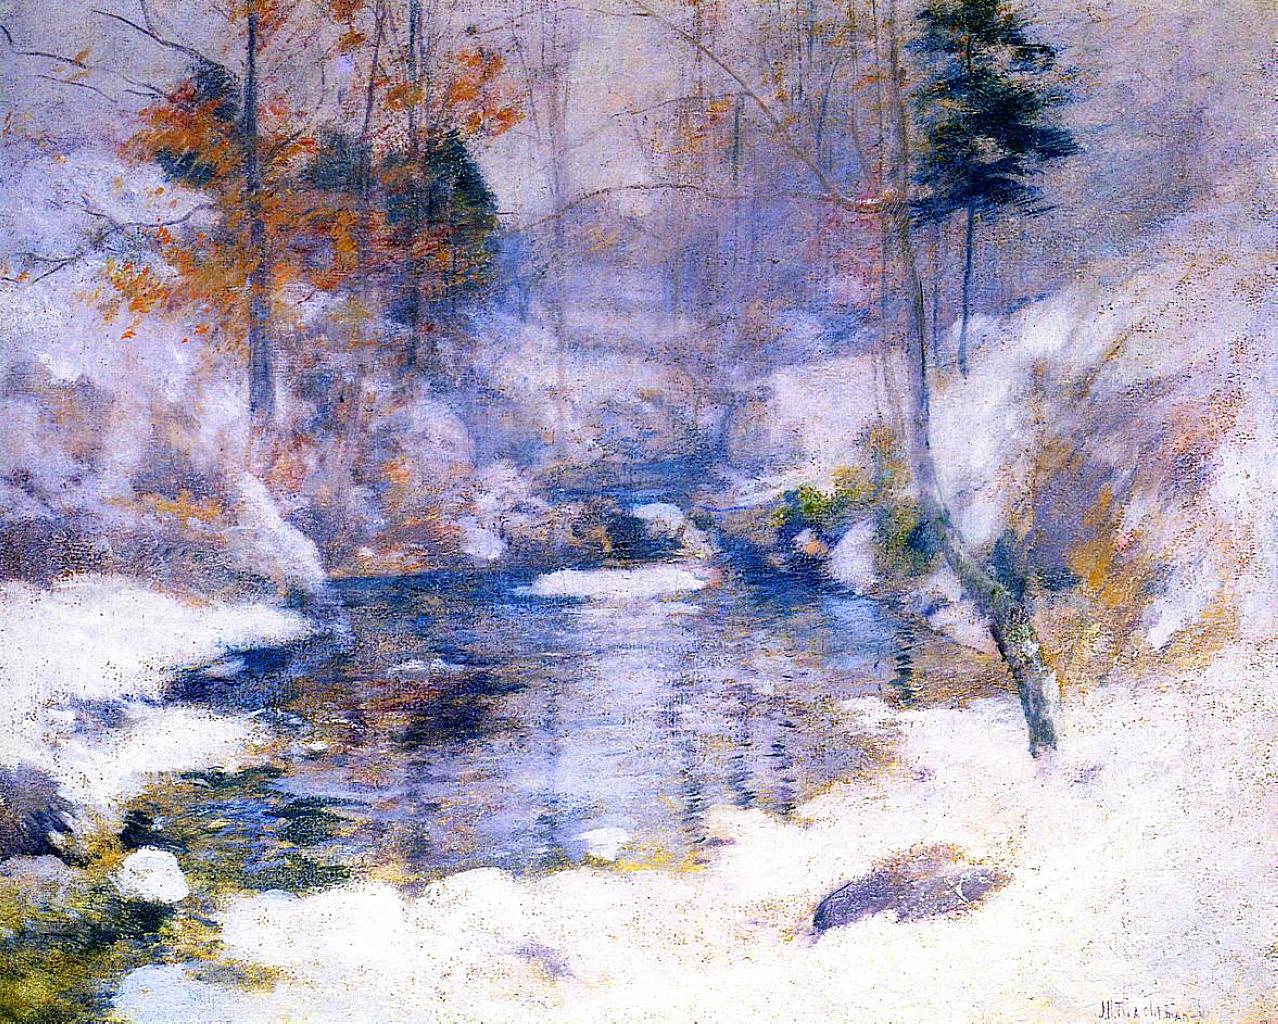 Winter Harmony, 1893-1900